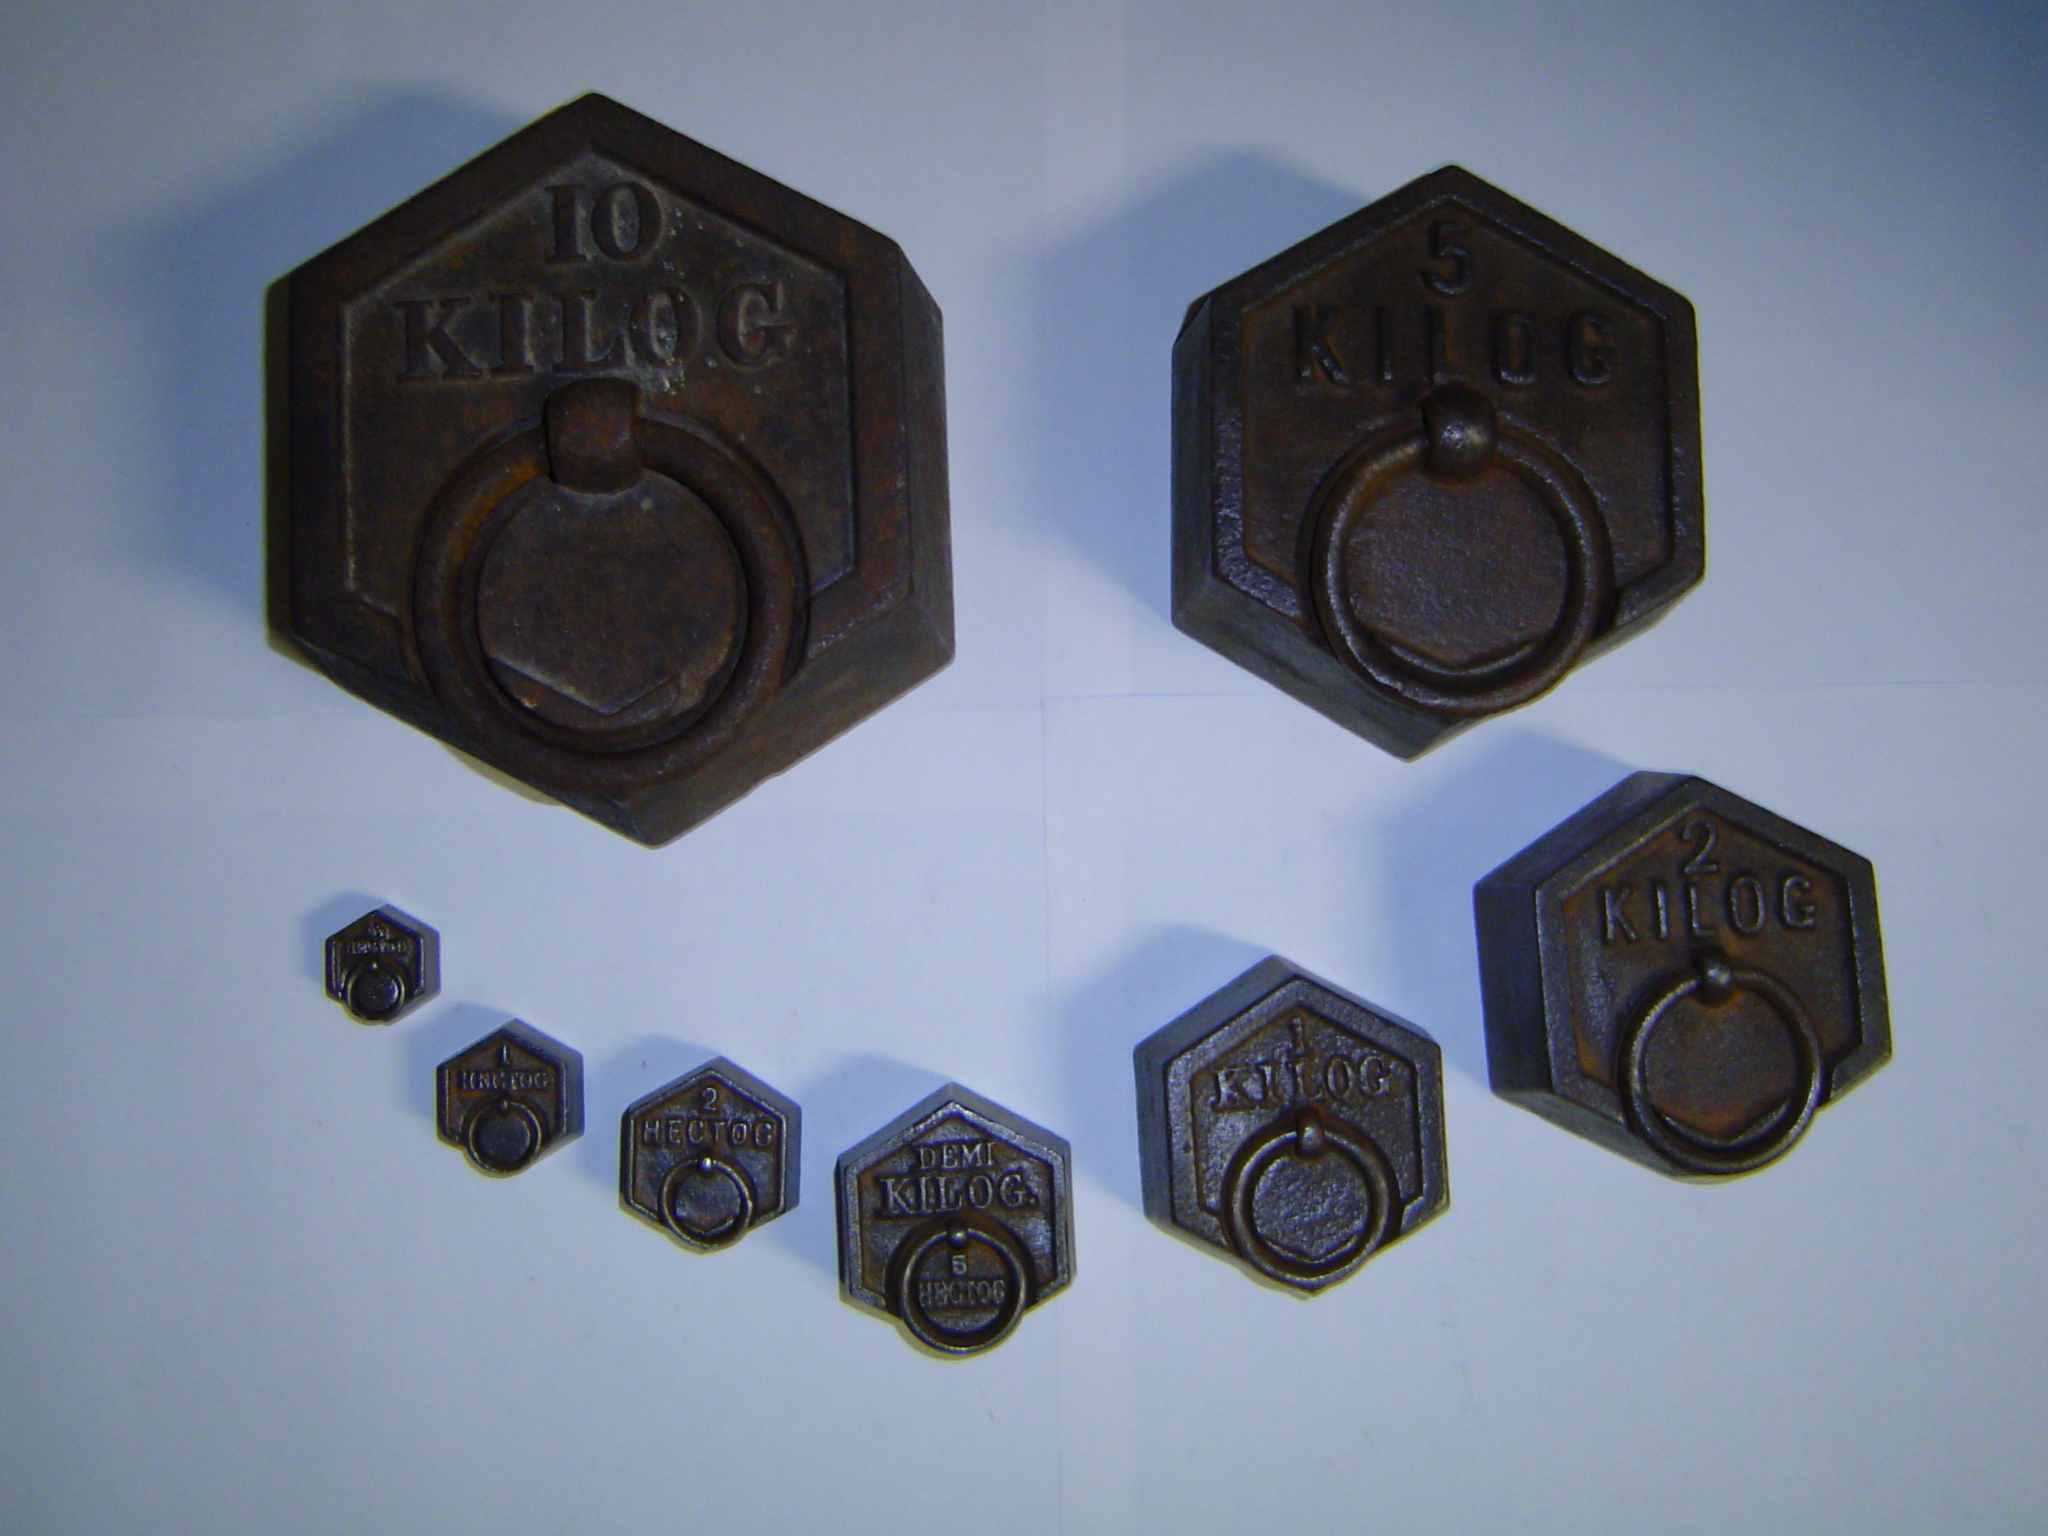 file poids en fonte 10 kg jusque 50 g jpg wikimedia commons. Black Bedroom Furniture Sets. Home Design Ideas